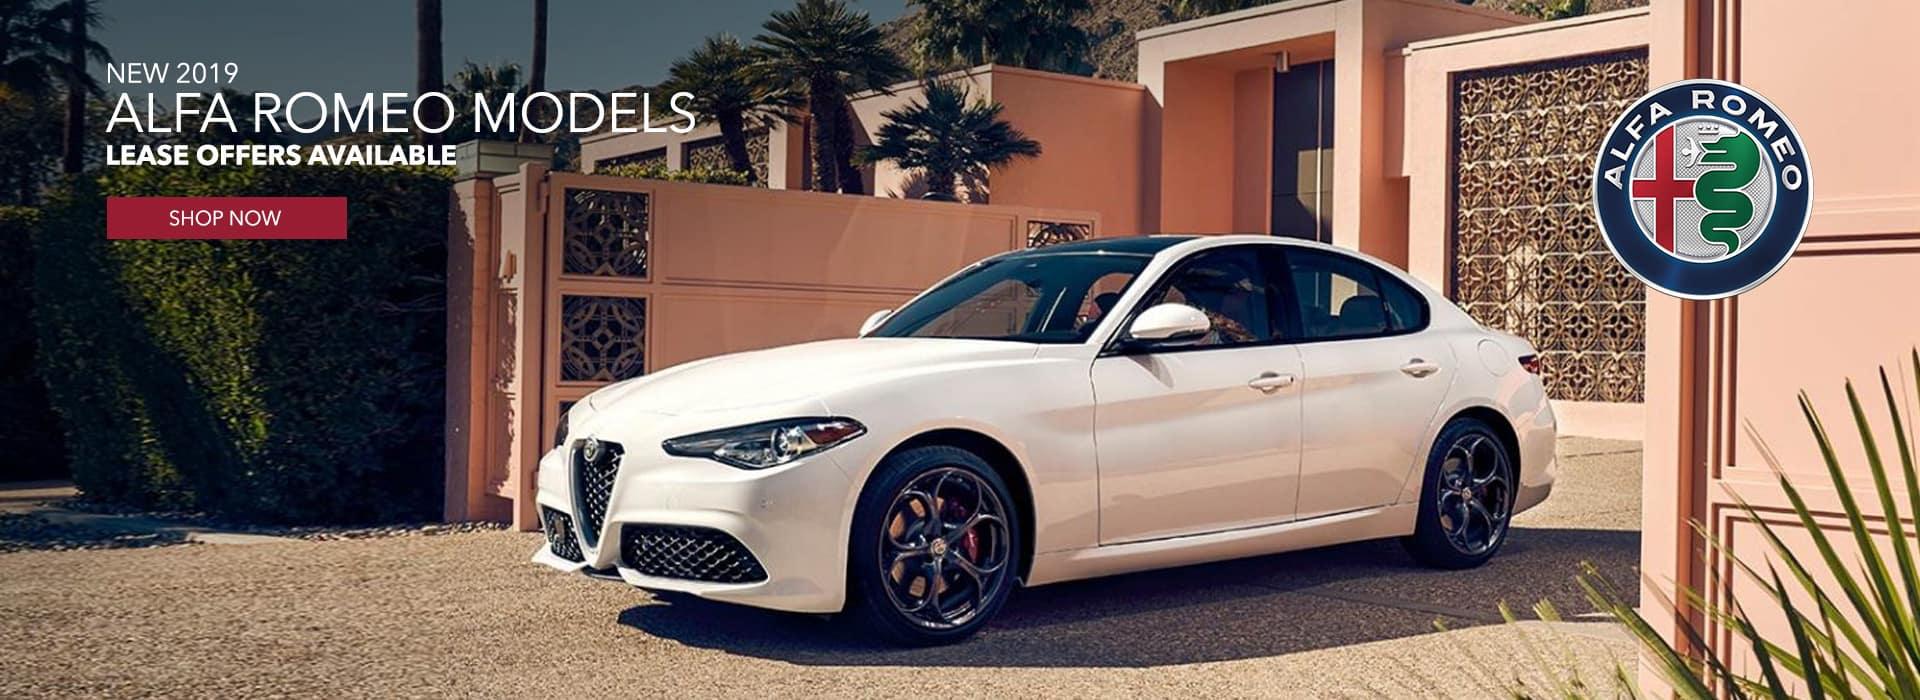 Used Cars Charleston Sc >> Alfa Romeo Dealership Charleston Sc Mount Pleasant Summerville